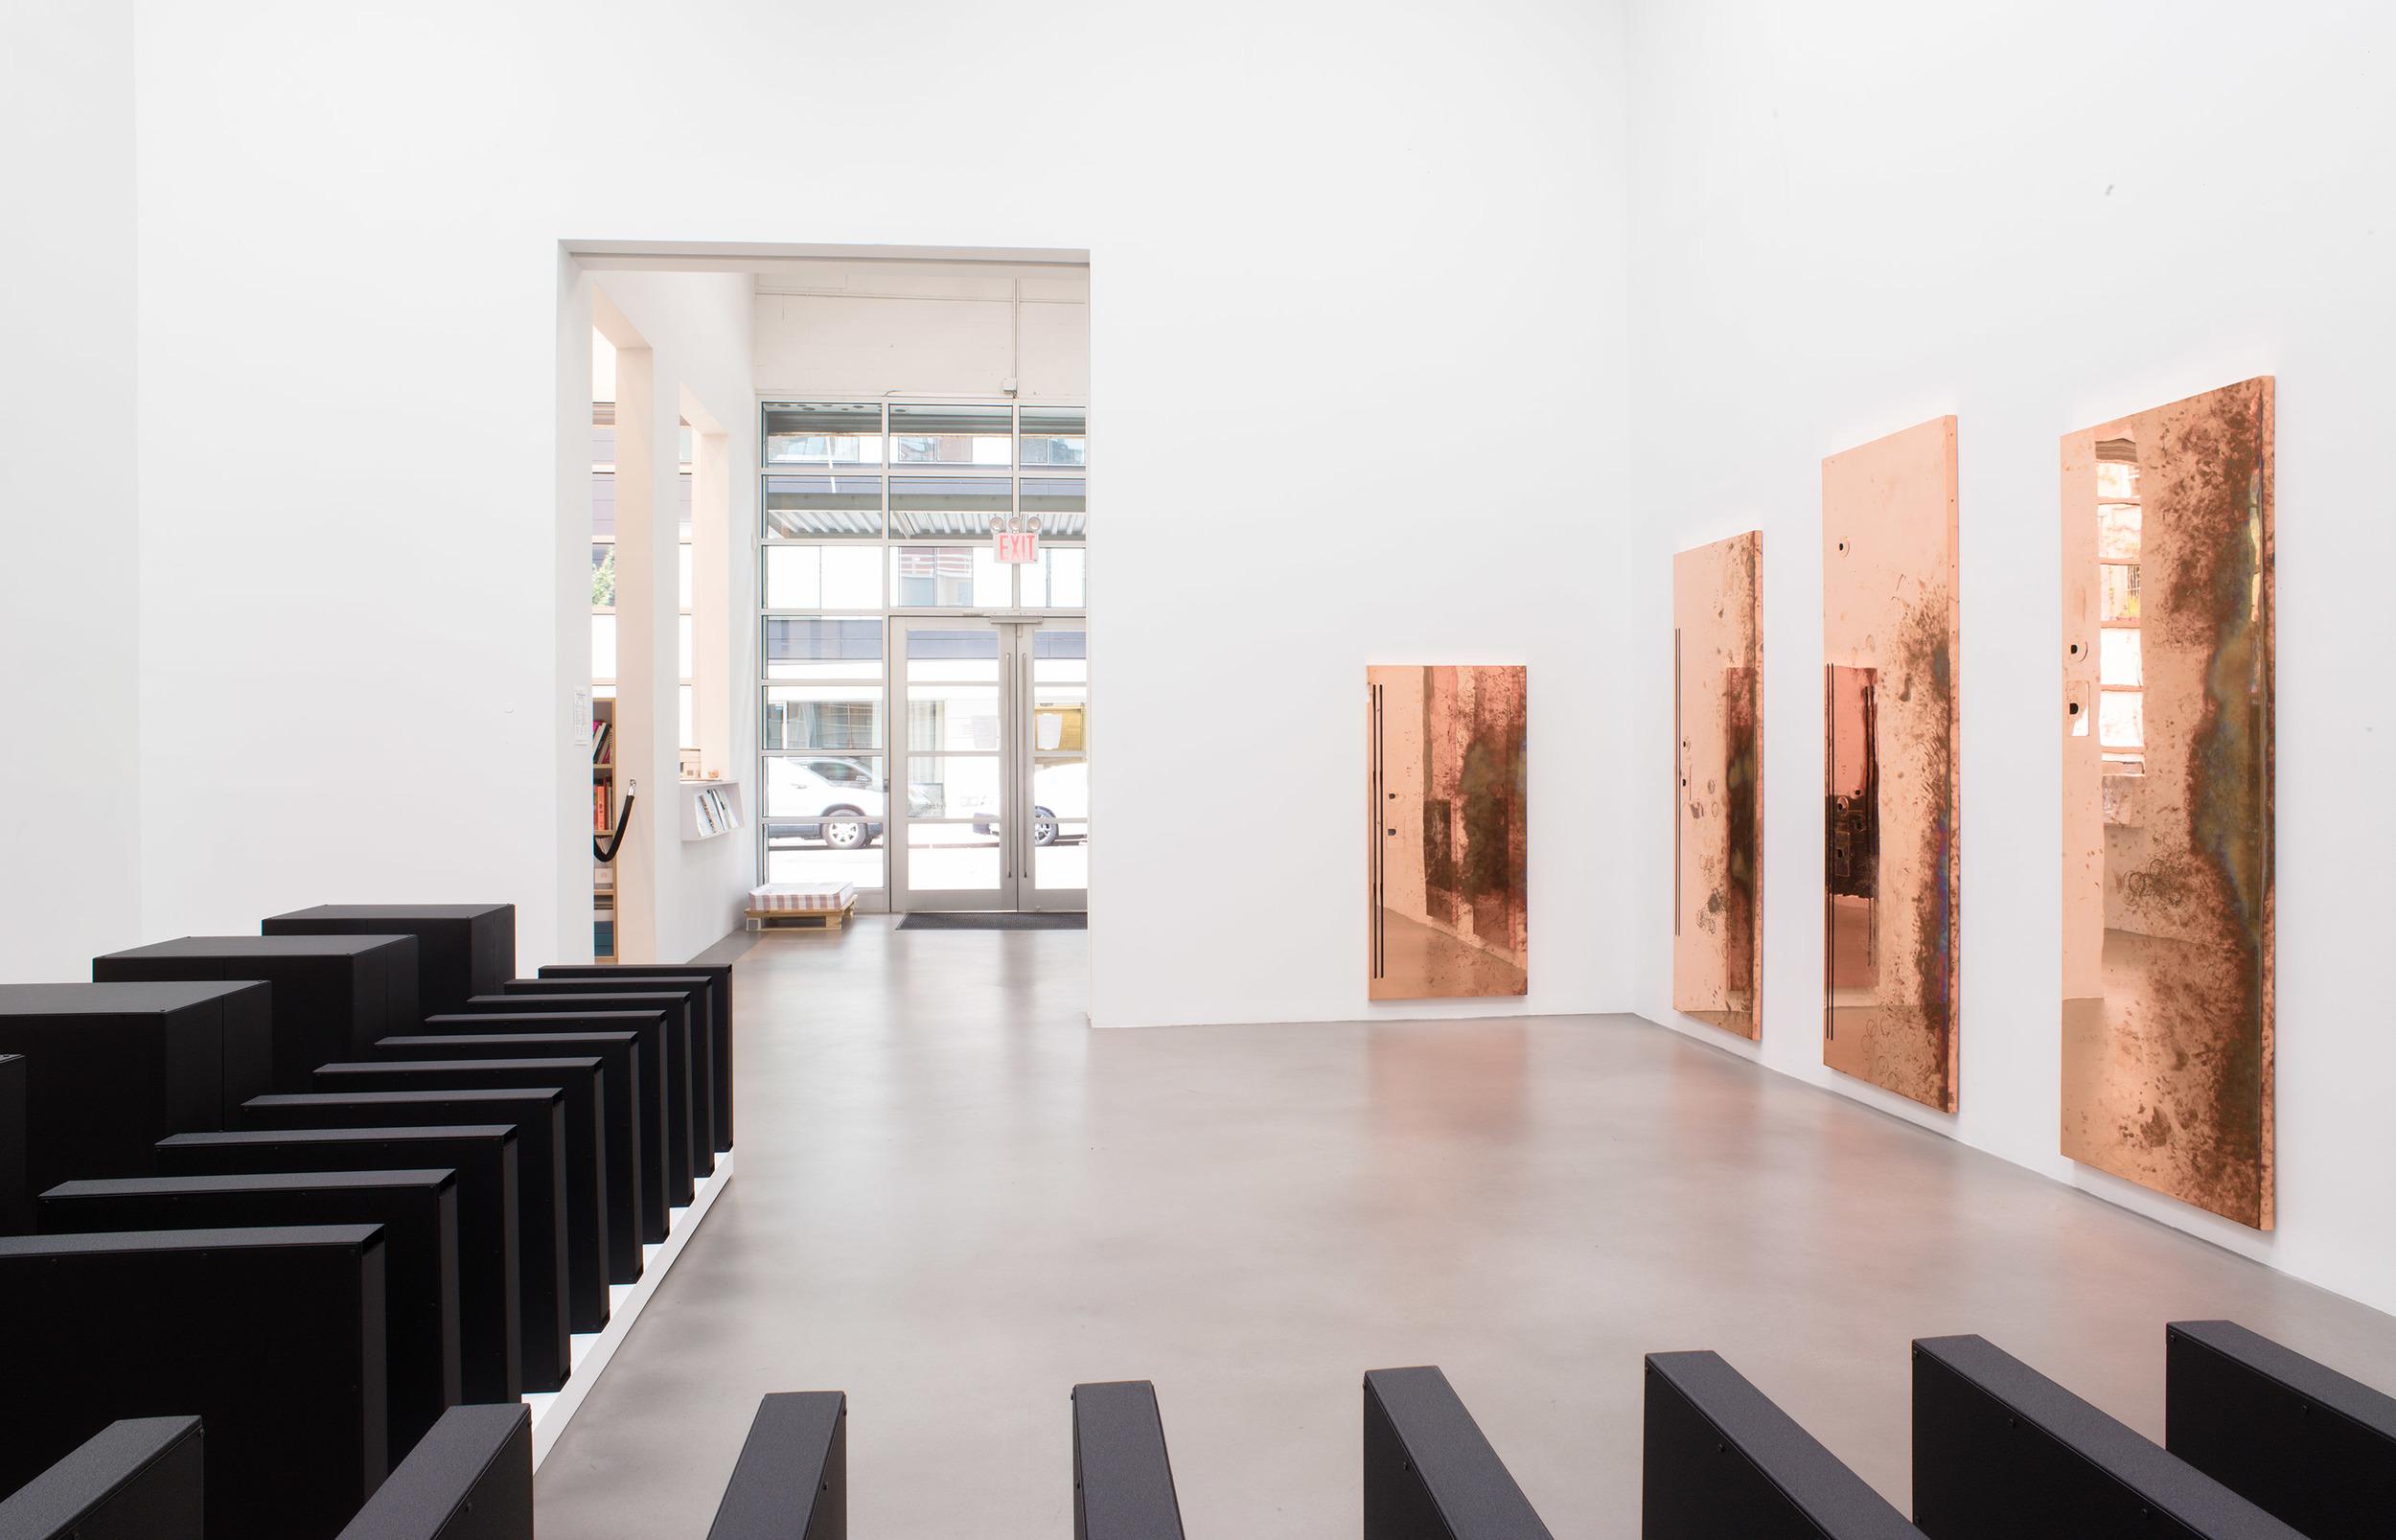 Performances Under Working Conditions   Petzel  New York  New York  2014